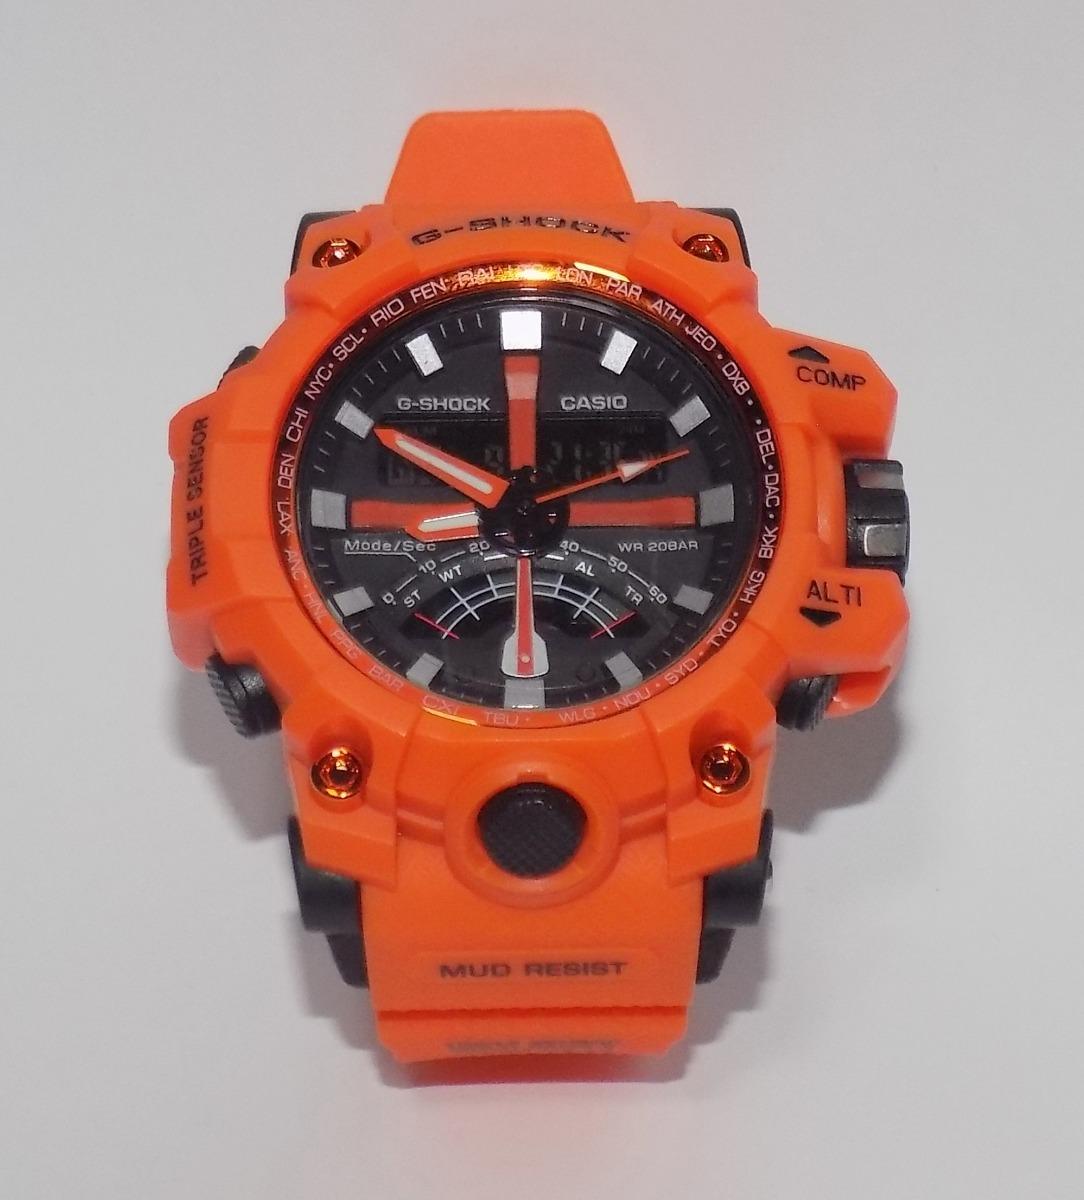 c9343b508ae relógio g shock importado analógico digital barato masculino. Carregando  zoom.